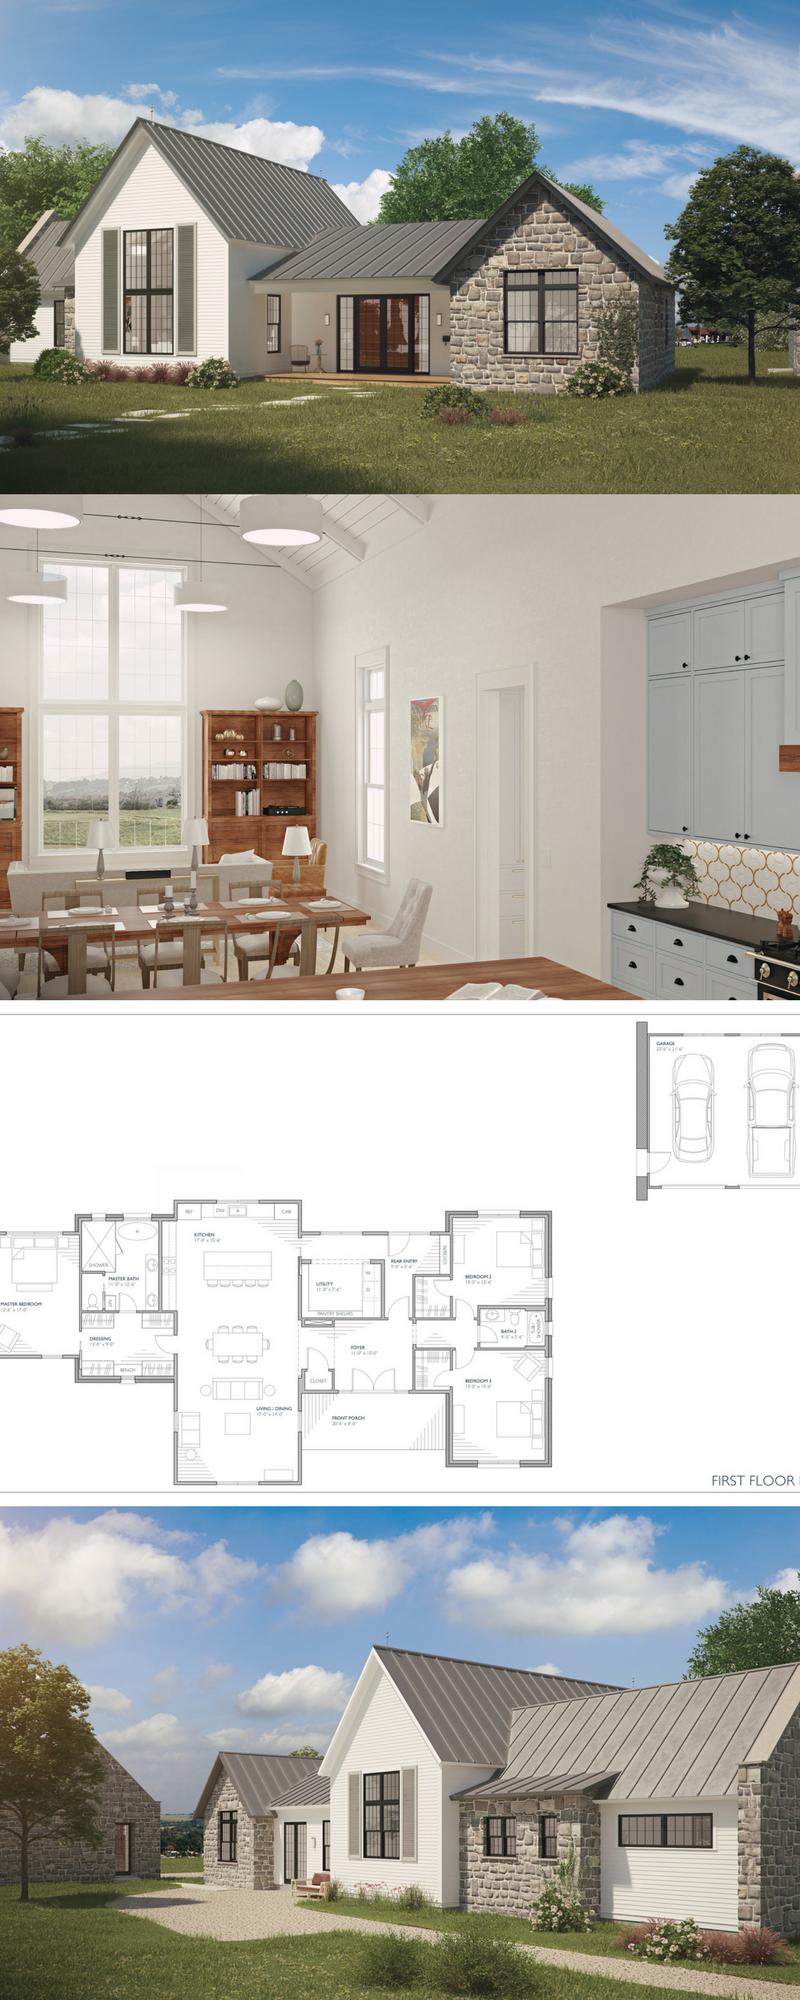 The mirandaise 2250 sf european farmhouse floor plans for sale designer house plans now available french modern farmhouse inspired designs